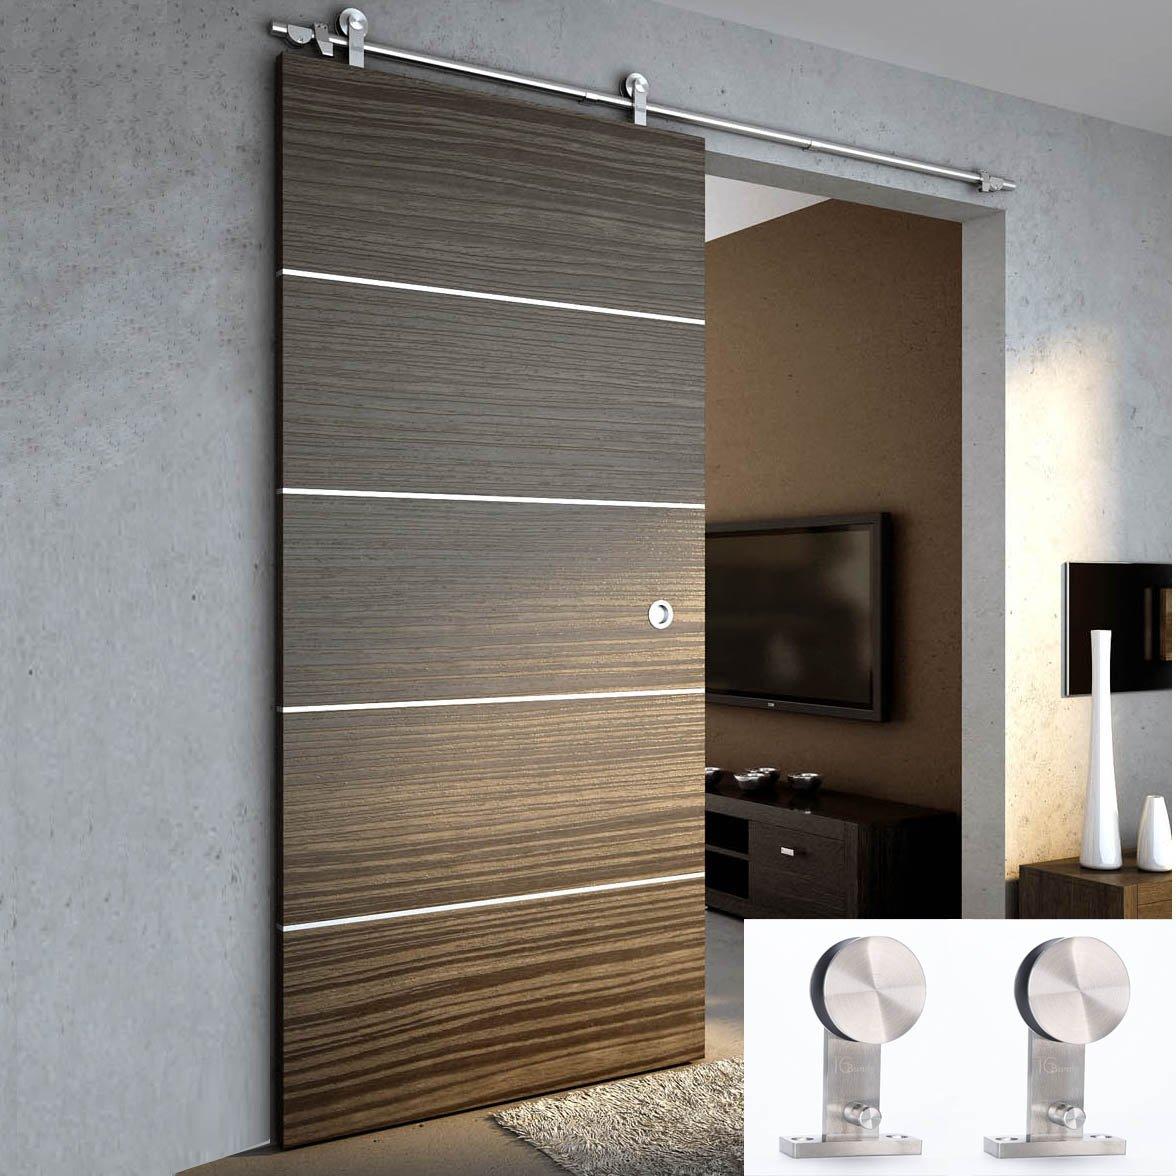 Modern Interior Sliding Doors Amazoncom Tcbunny 6 Ft 7 Inch Modern Stainless Steel Interior